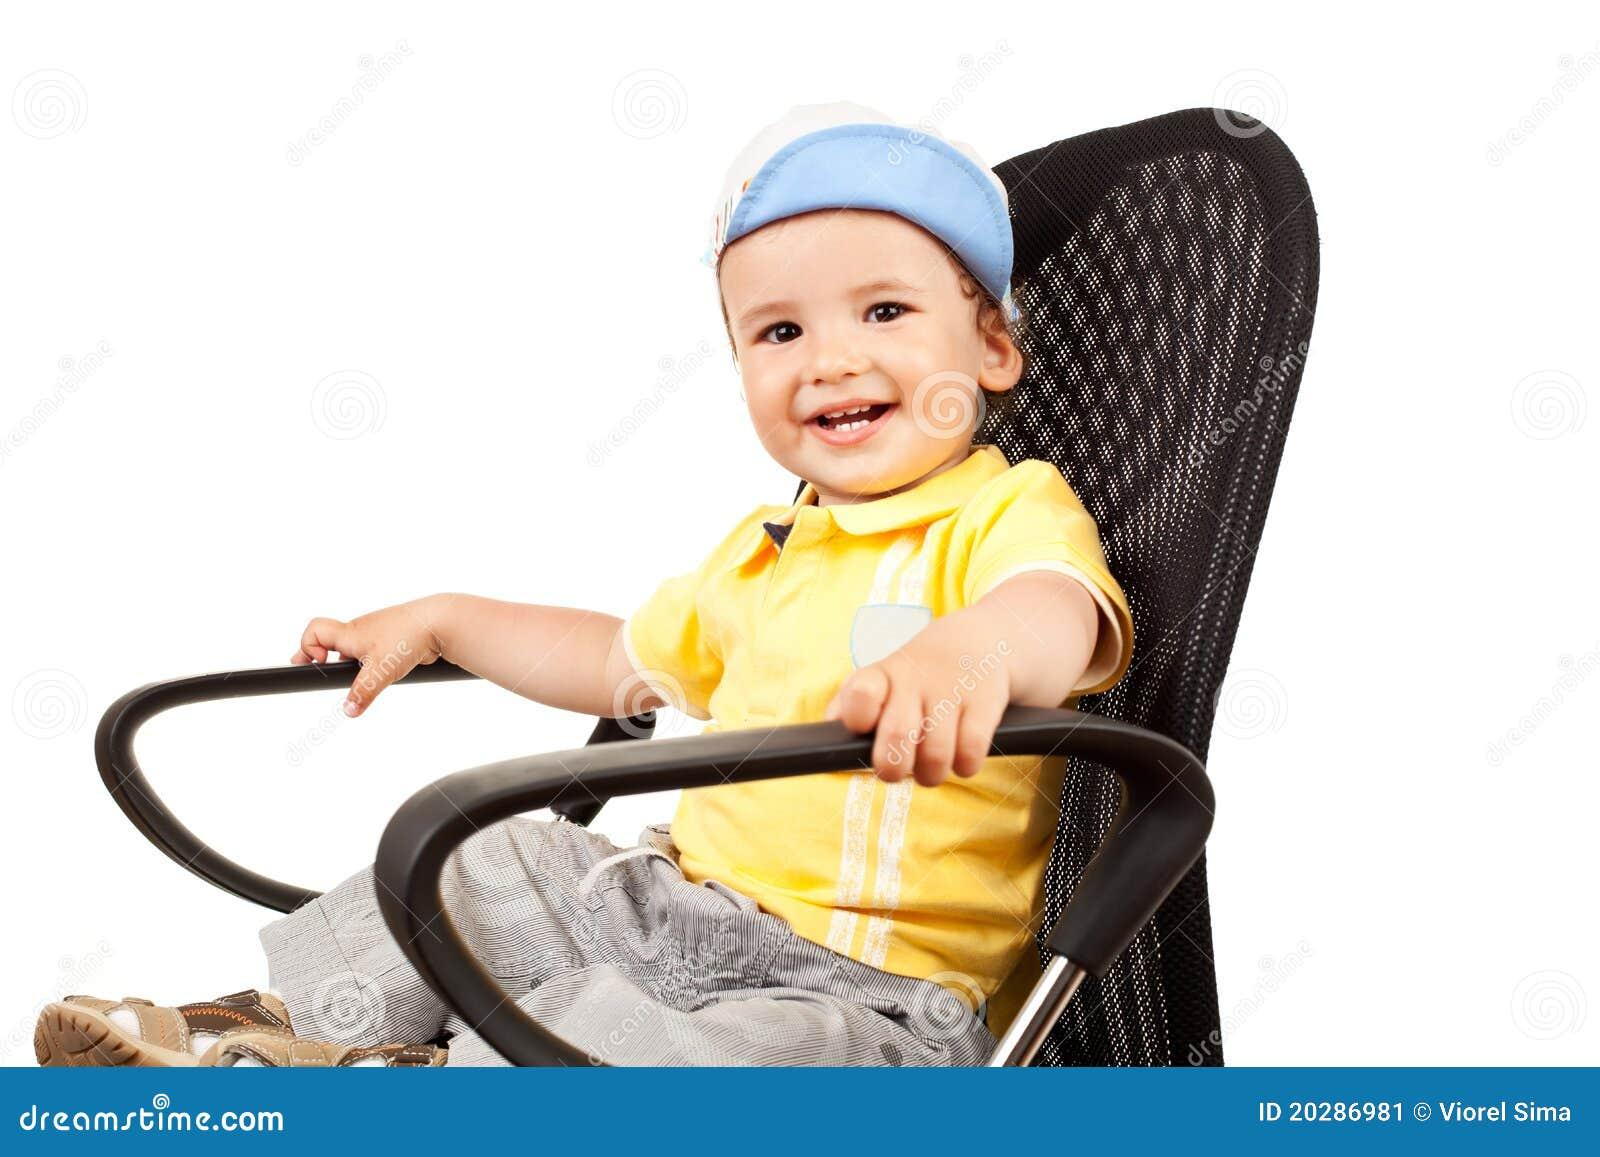 Black child sitting in chair - Boy Chair Little Sitting White Face Child